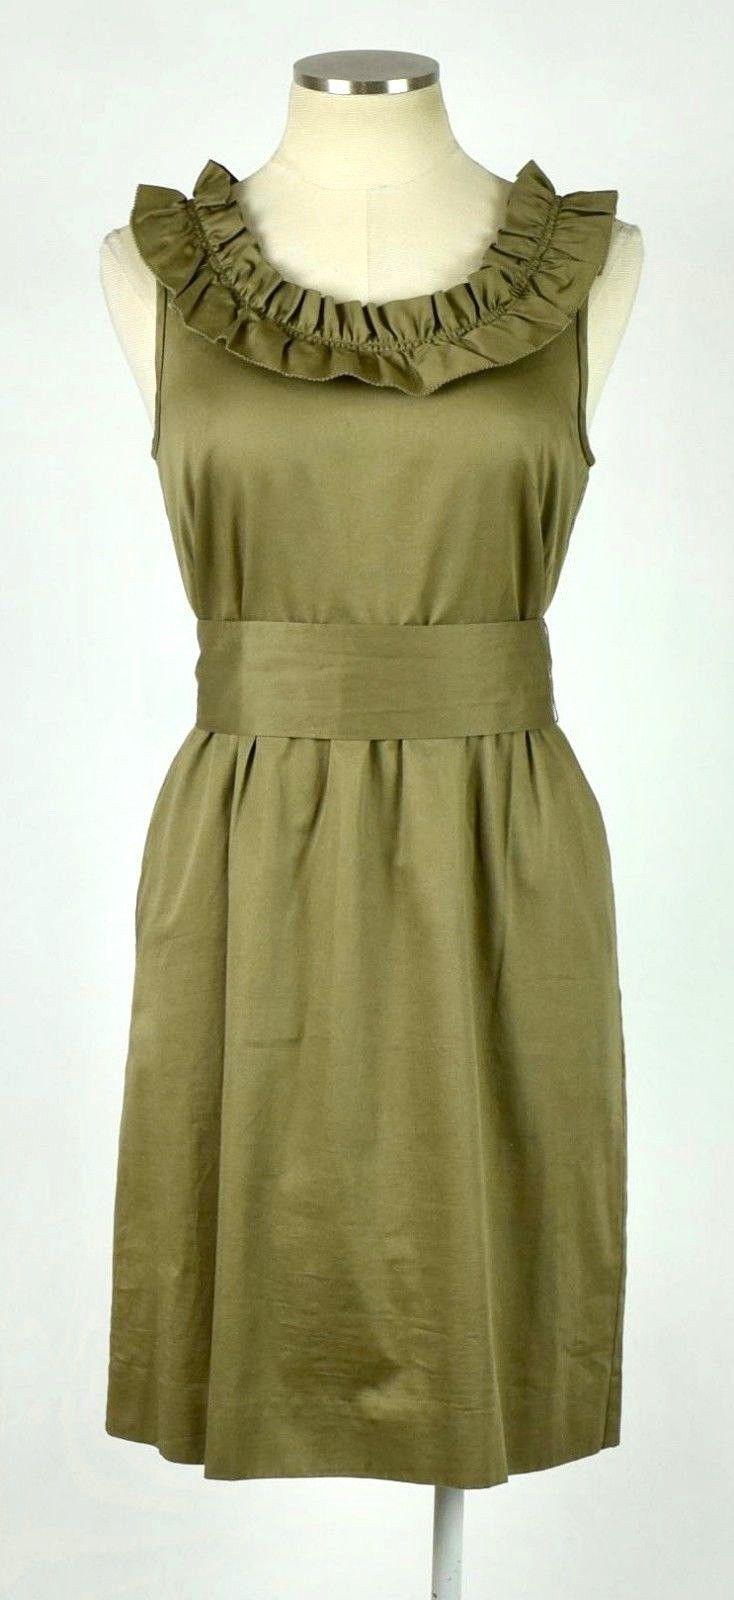 J.Crew Olive Ruffled Cotton Boat Neck Knee Length Shift Dress Sleeveless M